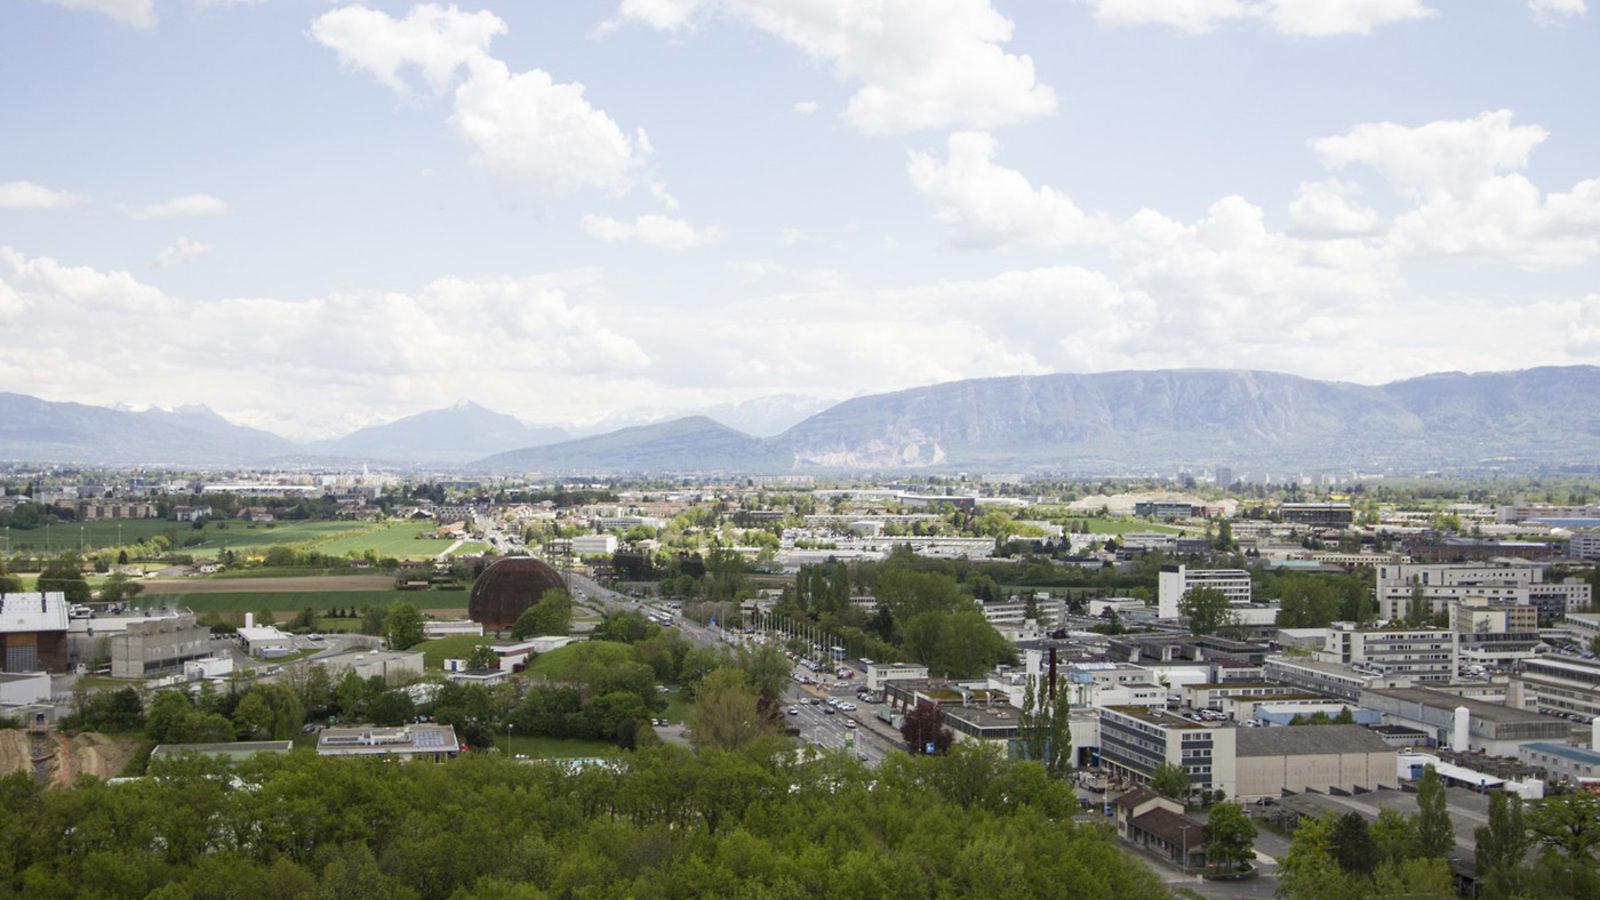 Photo of CERN aerial